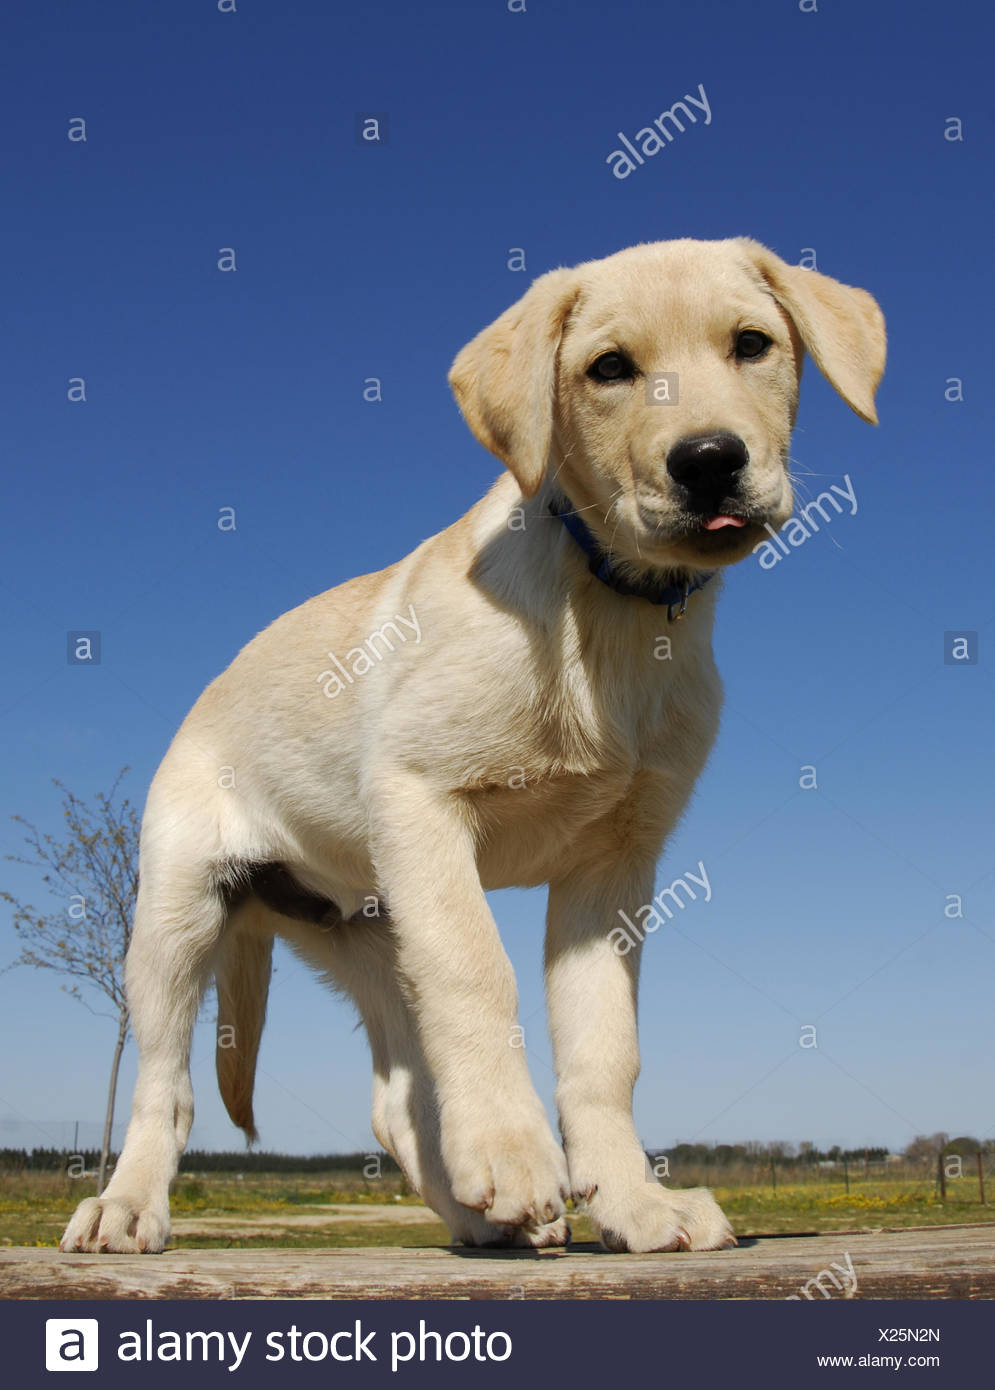 animal pet dog maddening pert coquettish cute labrador beautiful beauteously - Stock Image